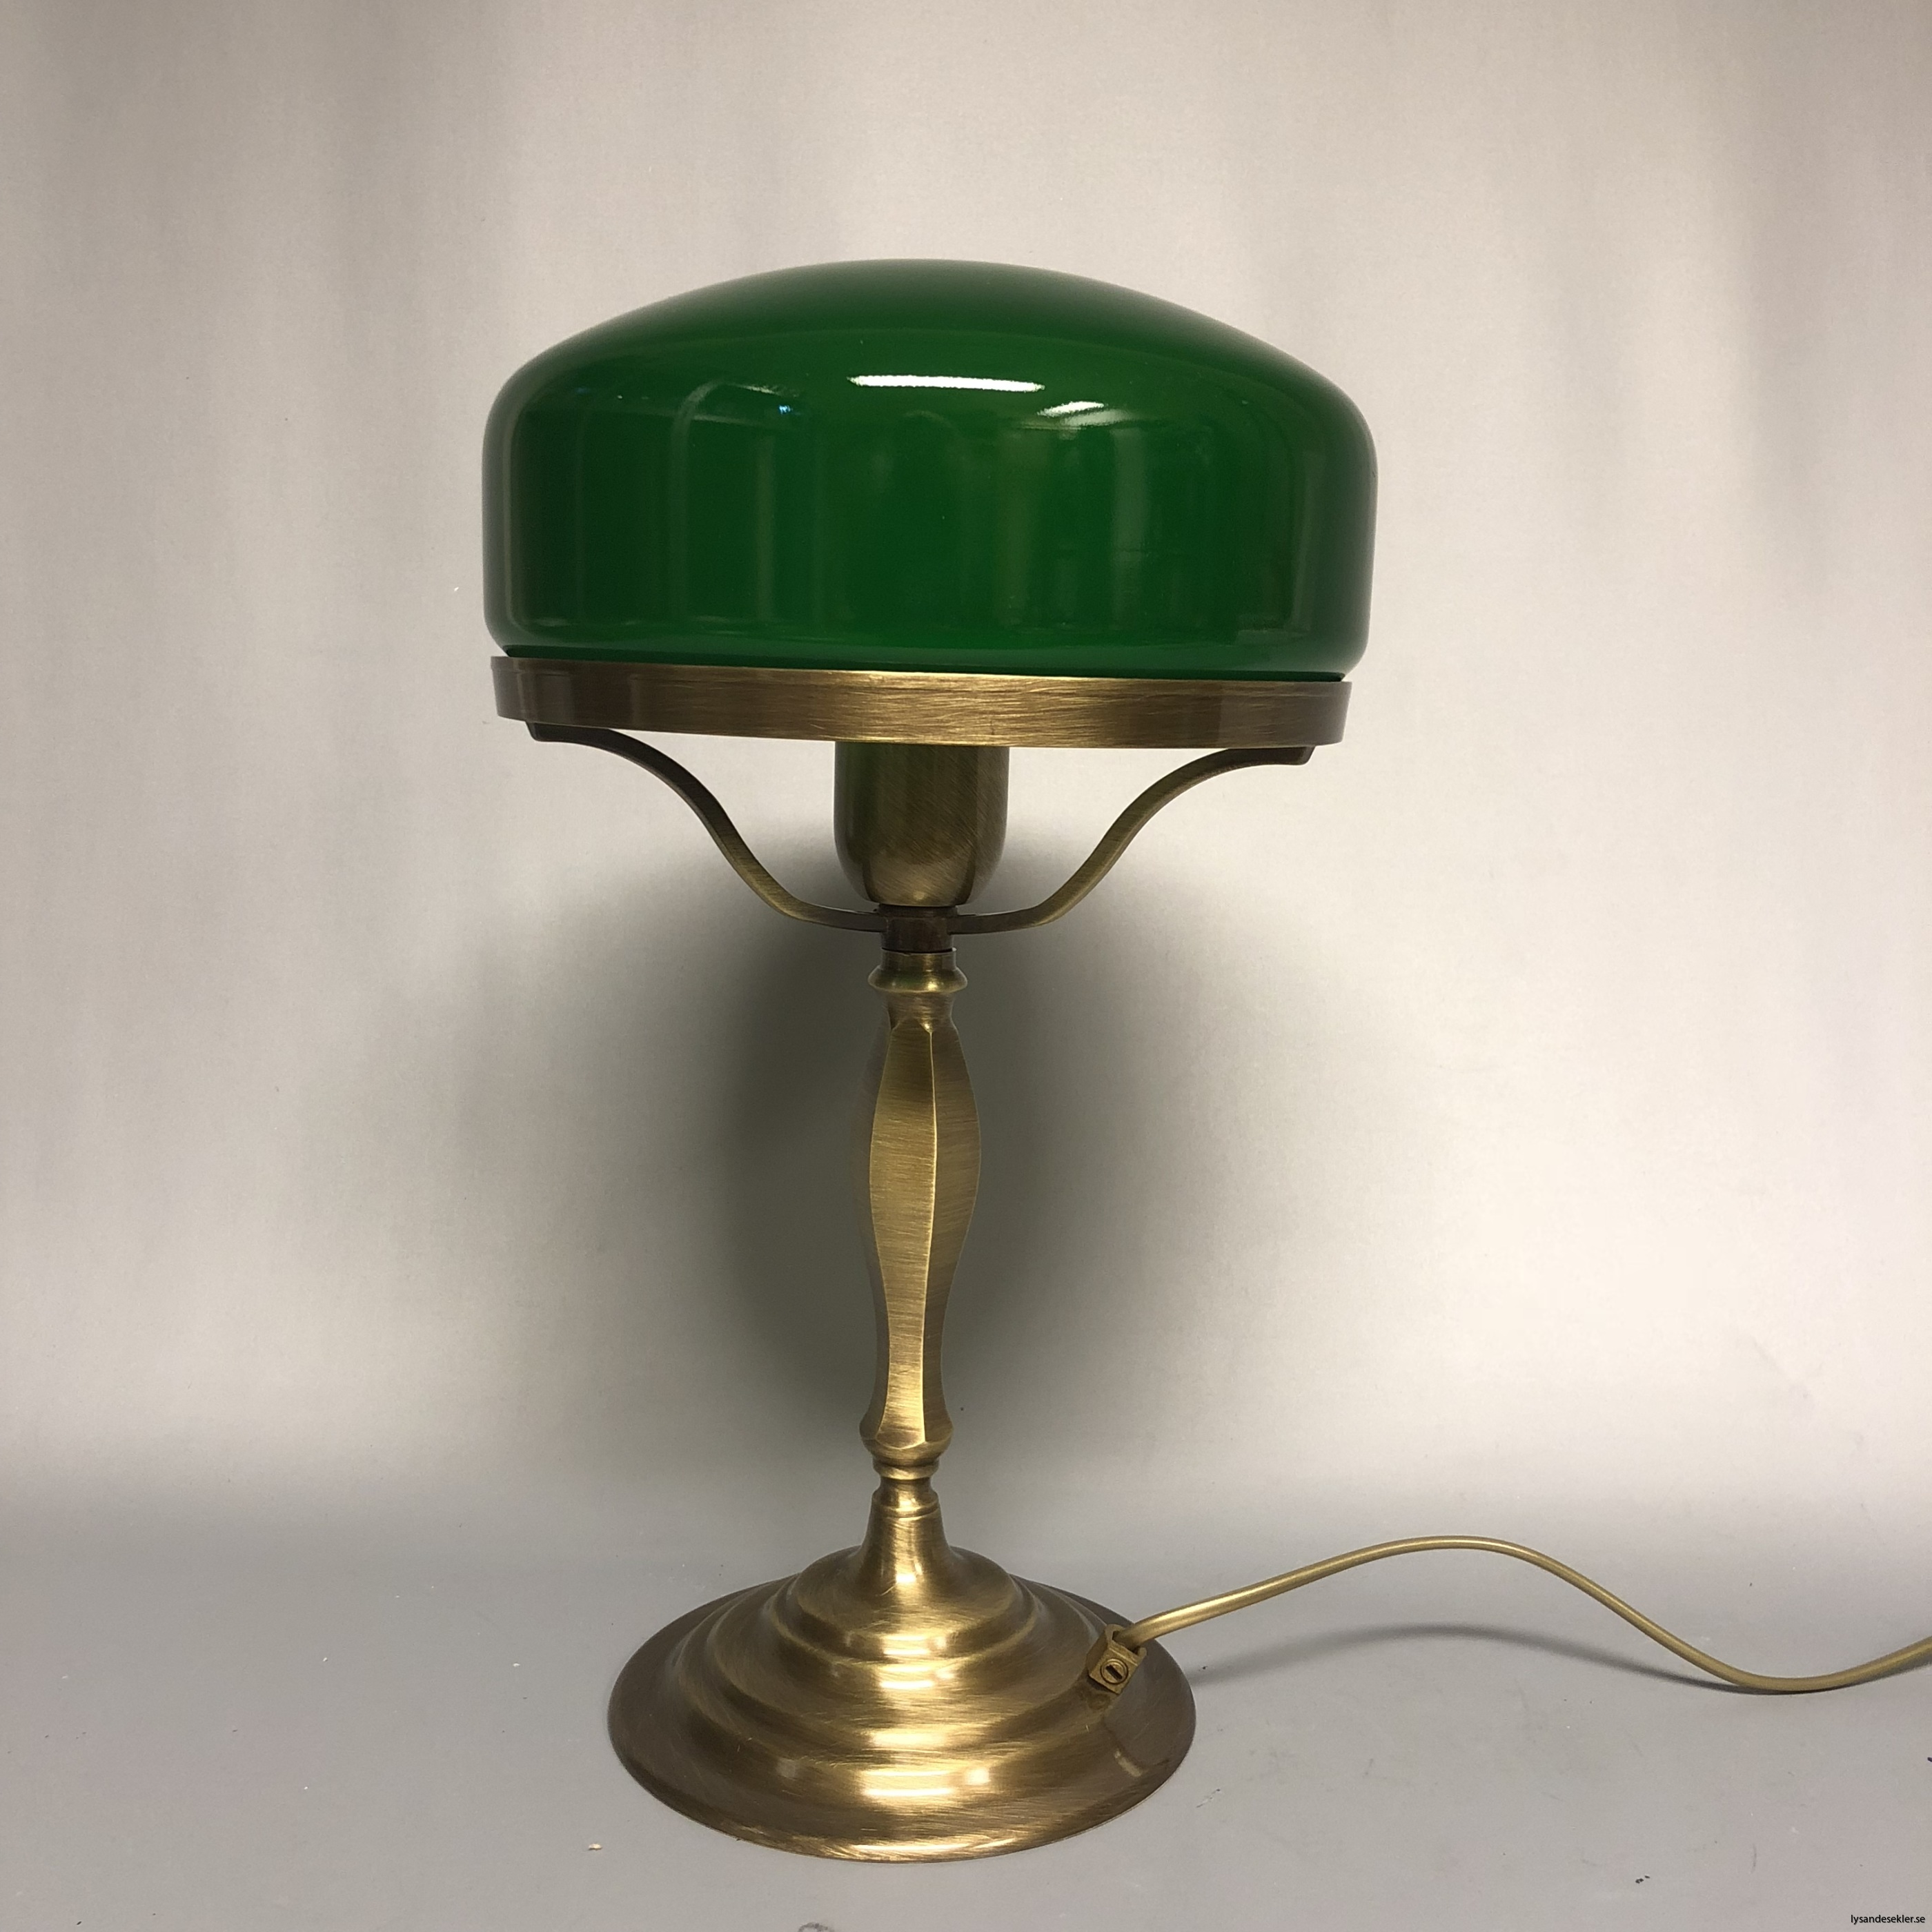 strindbergslampa strindbergslampor strindberg lampa skärm kupa strindbergsskärm strindbergskupa37